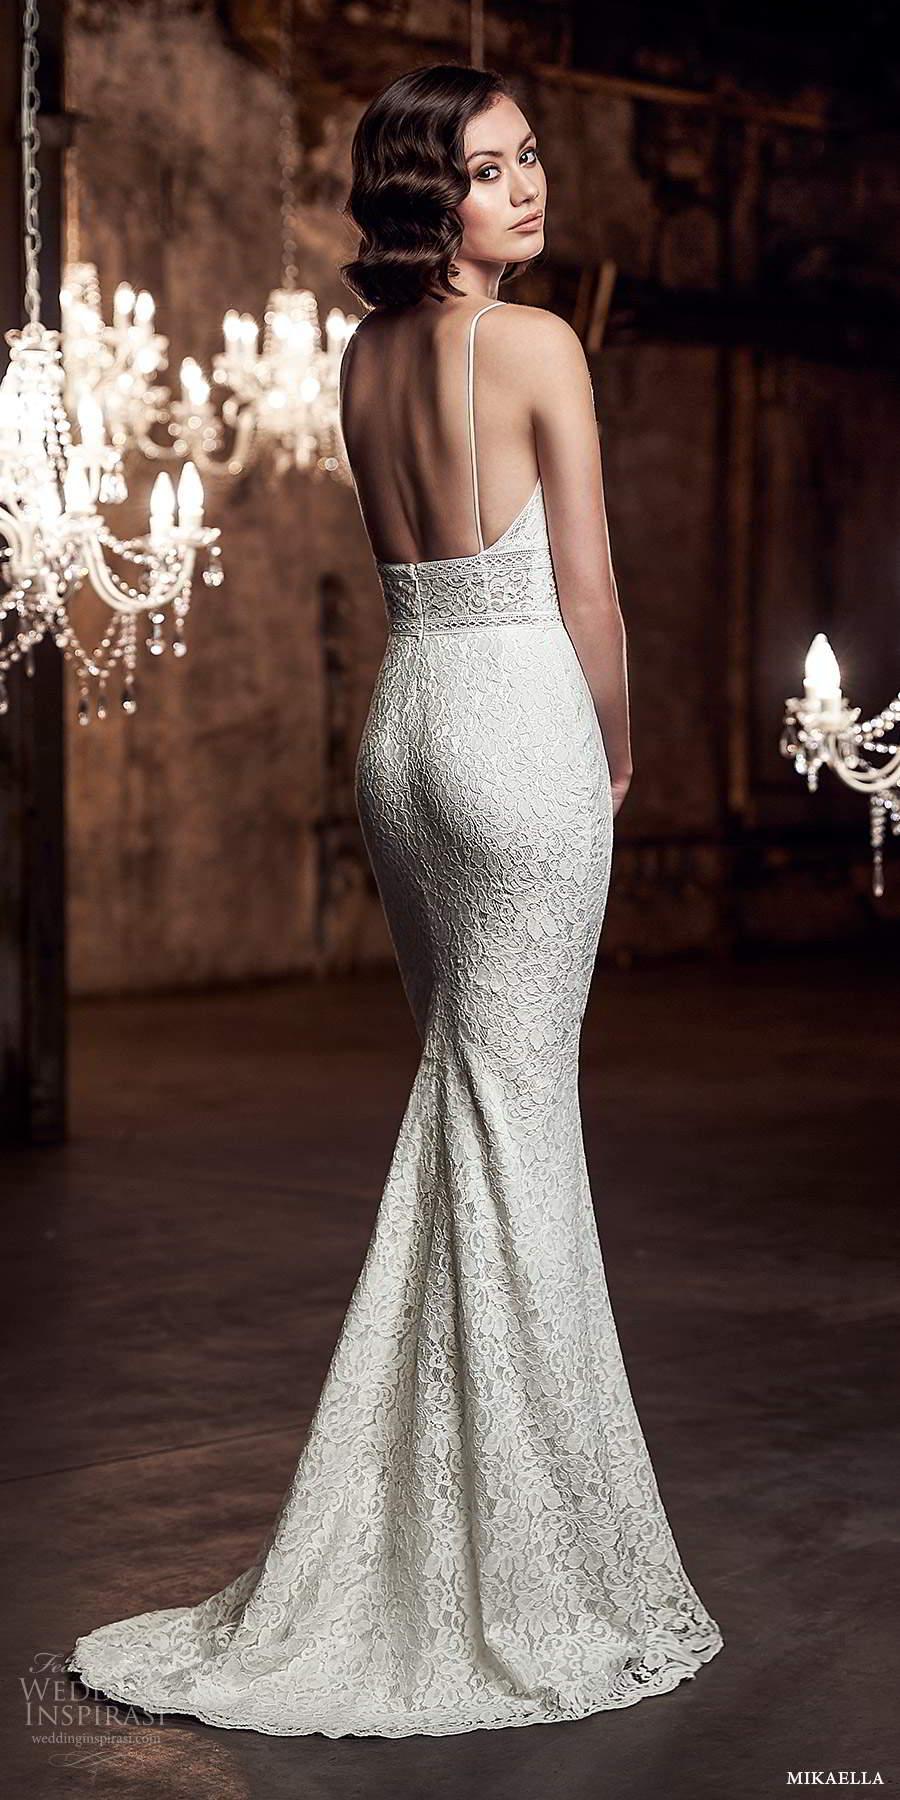 mikaella fall 2020 bridal sleeveless spaghetti straps plunging sweetheart neckline fully embellished sheath wedding dress sweep train (4) bv